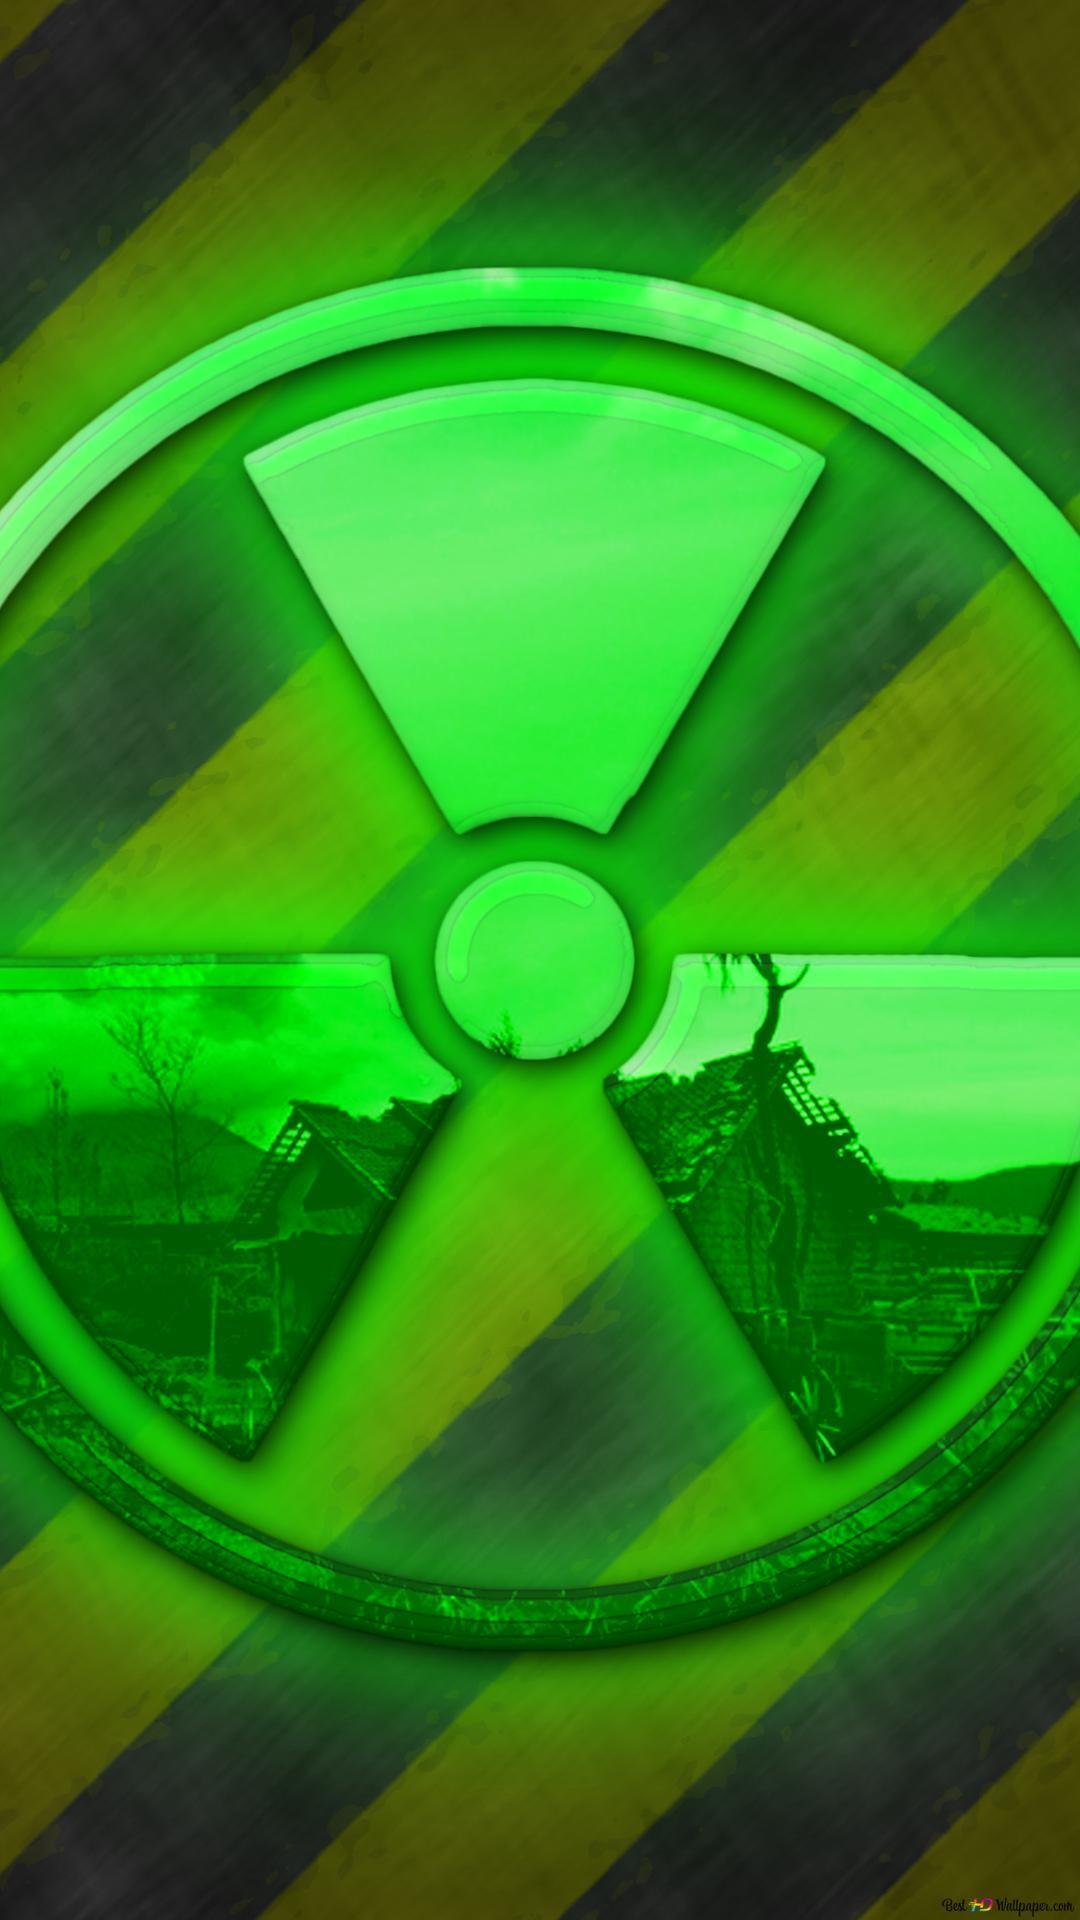 Radiation full hd hdtv fhd p wallpapers hd desktop